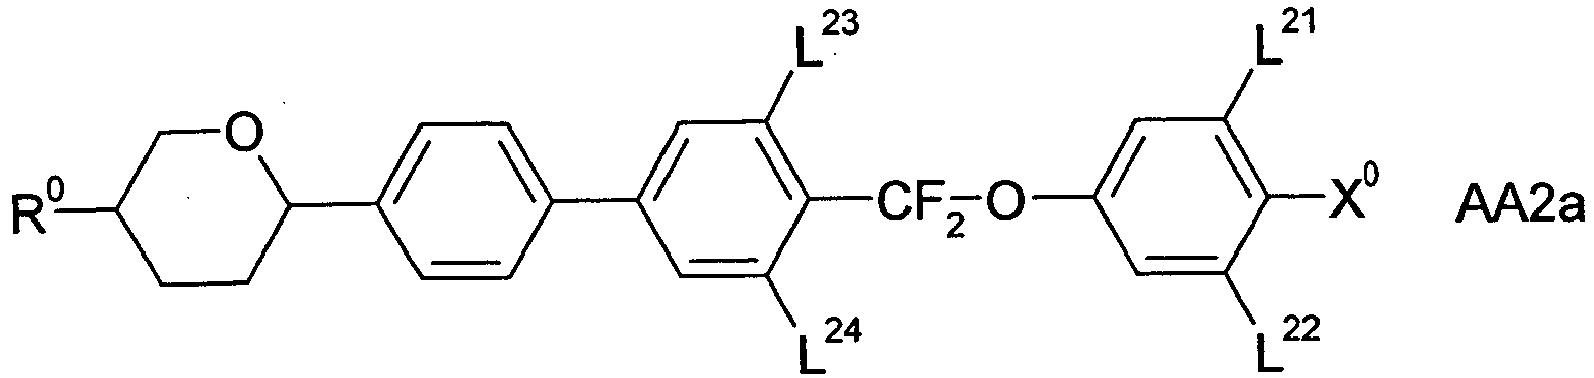 Figure imgb0492